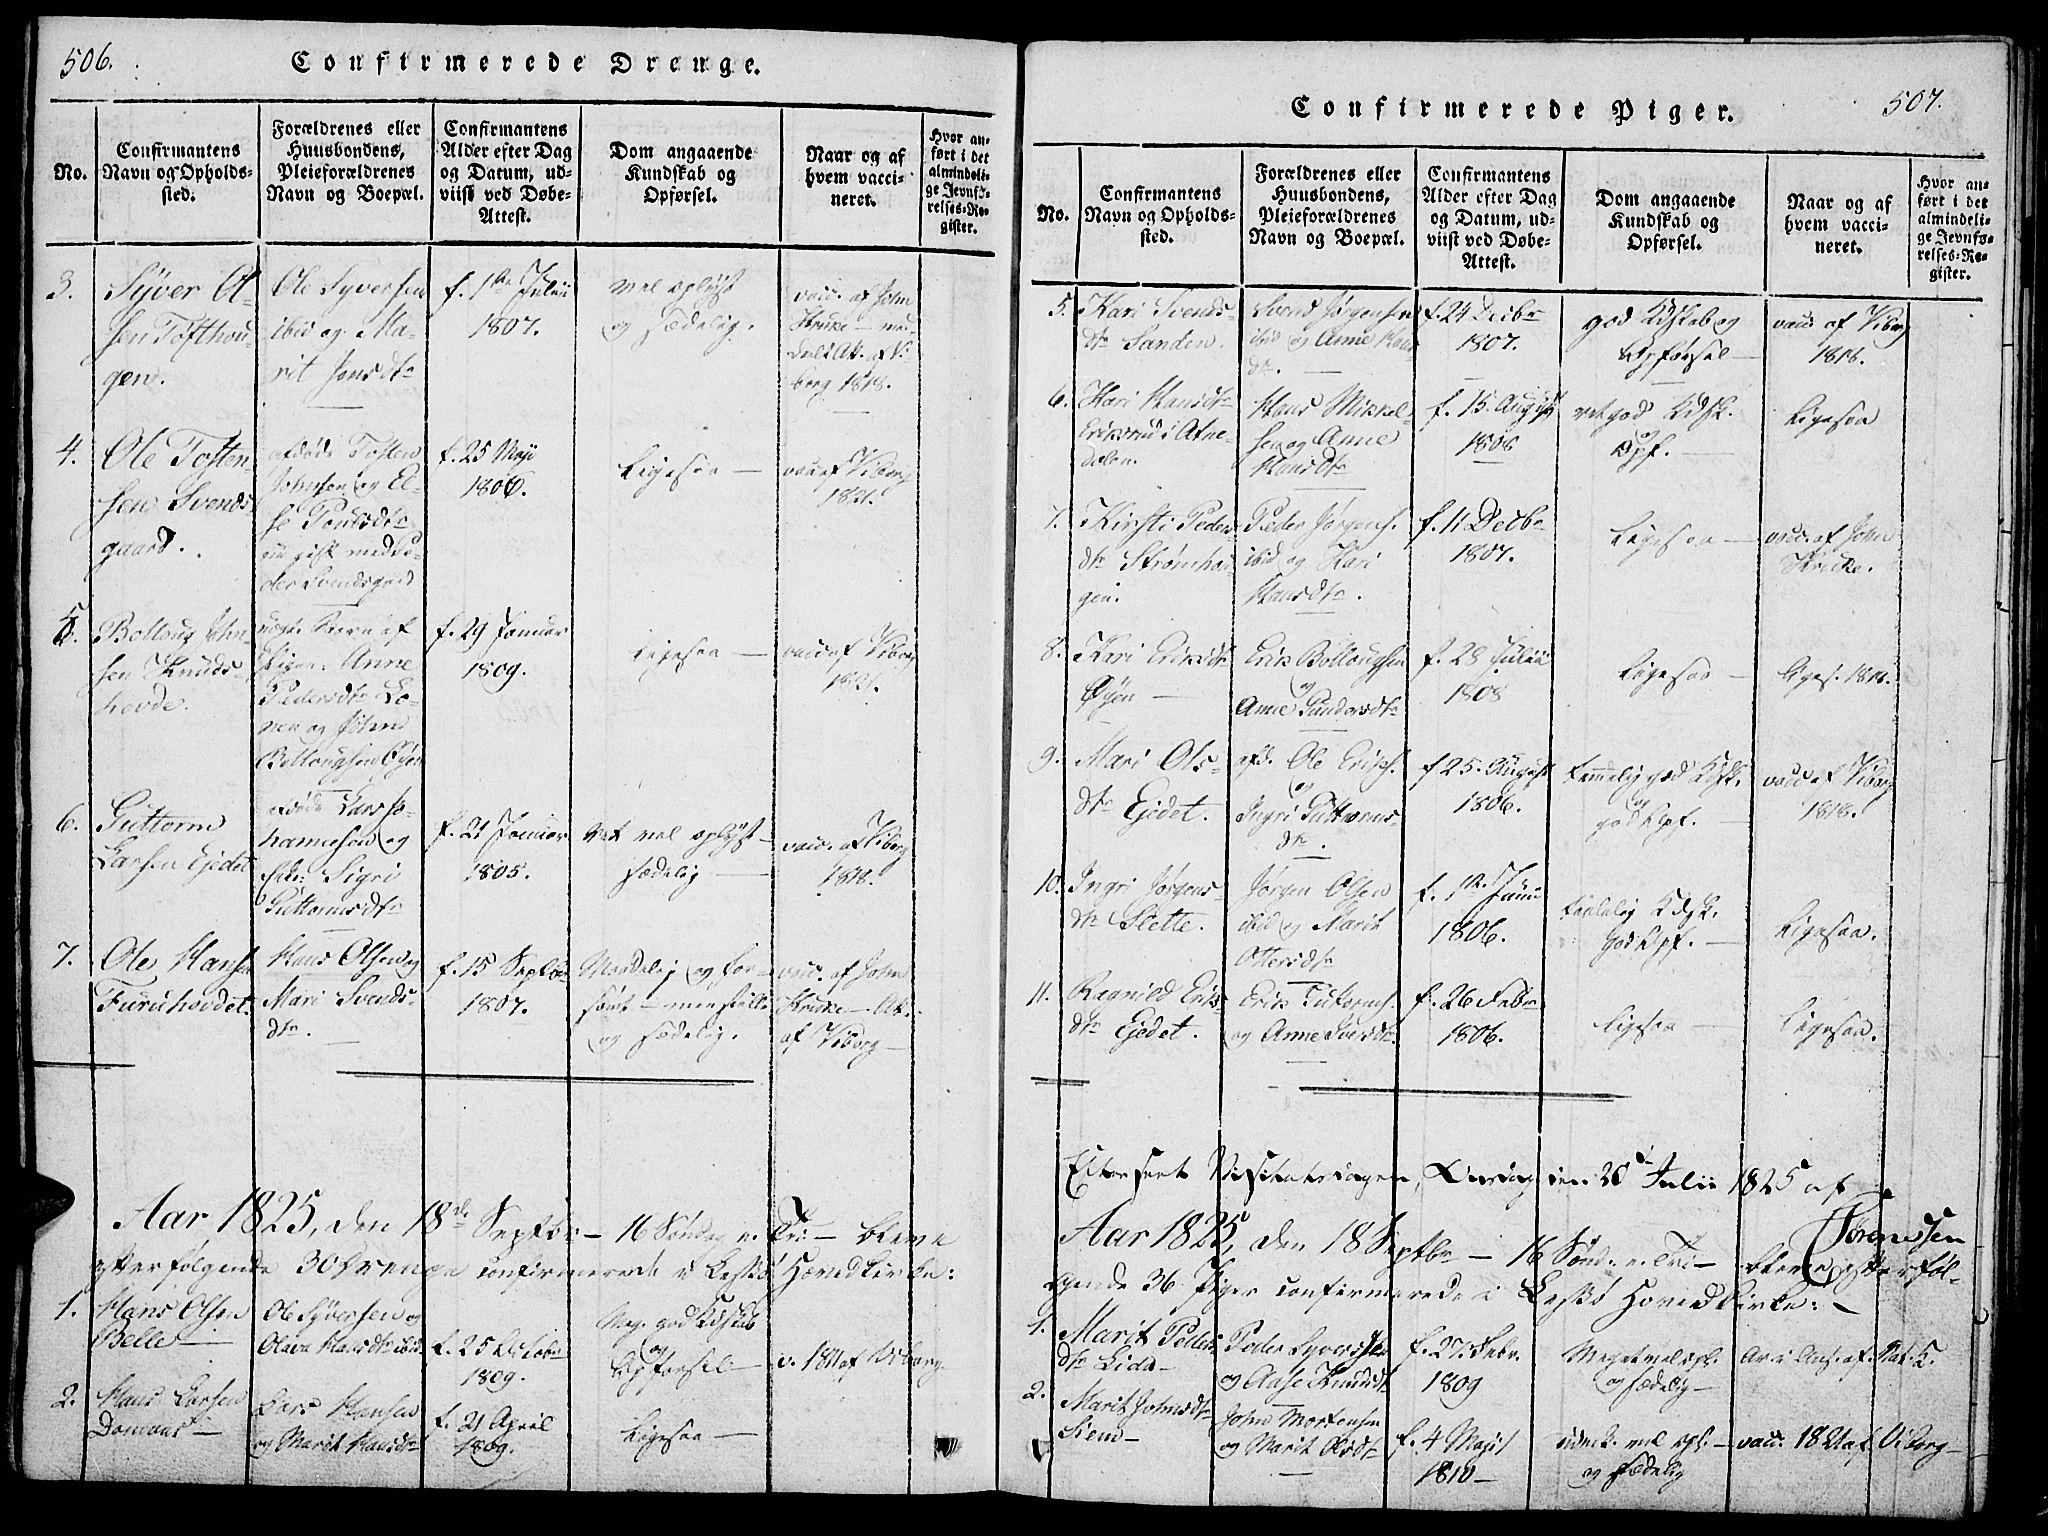 SAH, Lesja prestekontor, Ministerialbok nr. 4, 1820-1829, s. 506-507